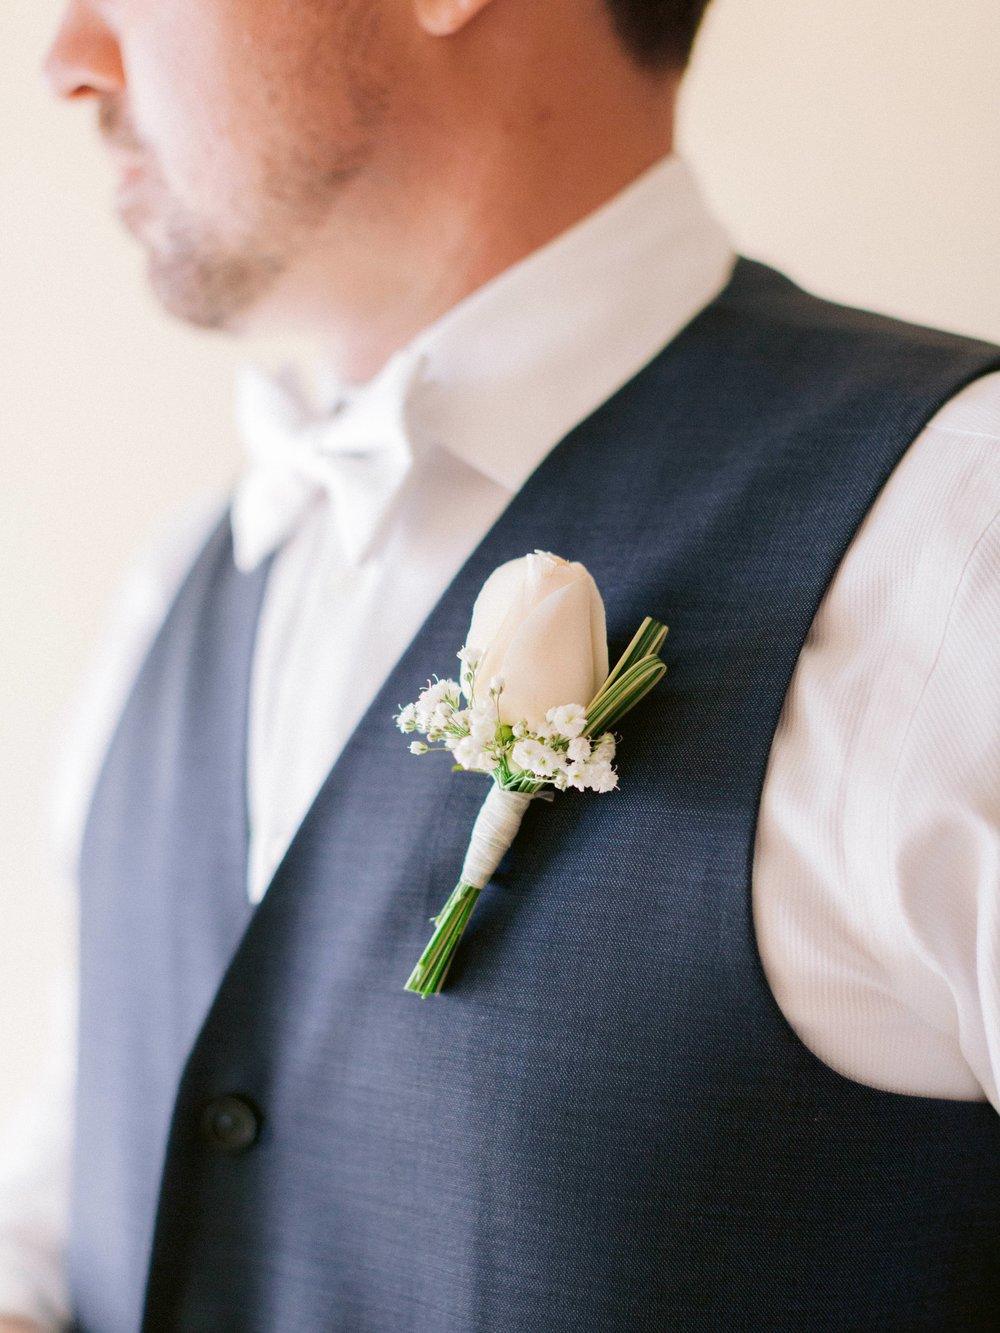 Kim_Jeff_Cancun Wedding_Getting_Ready_Kurtz_Orpia (91 of 105).jpg